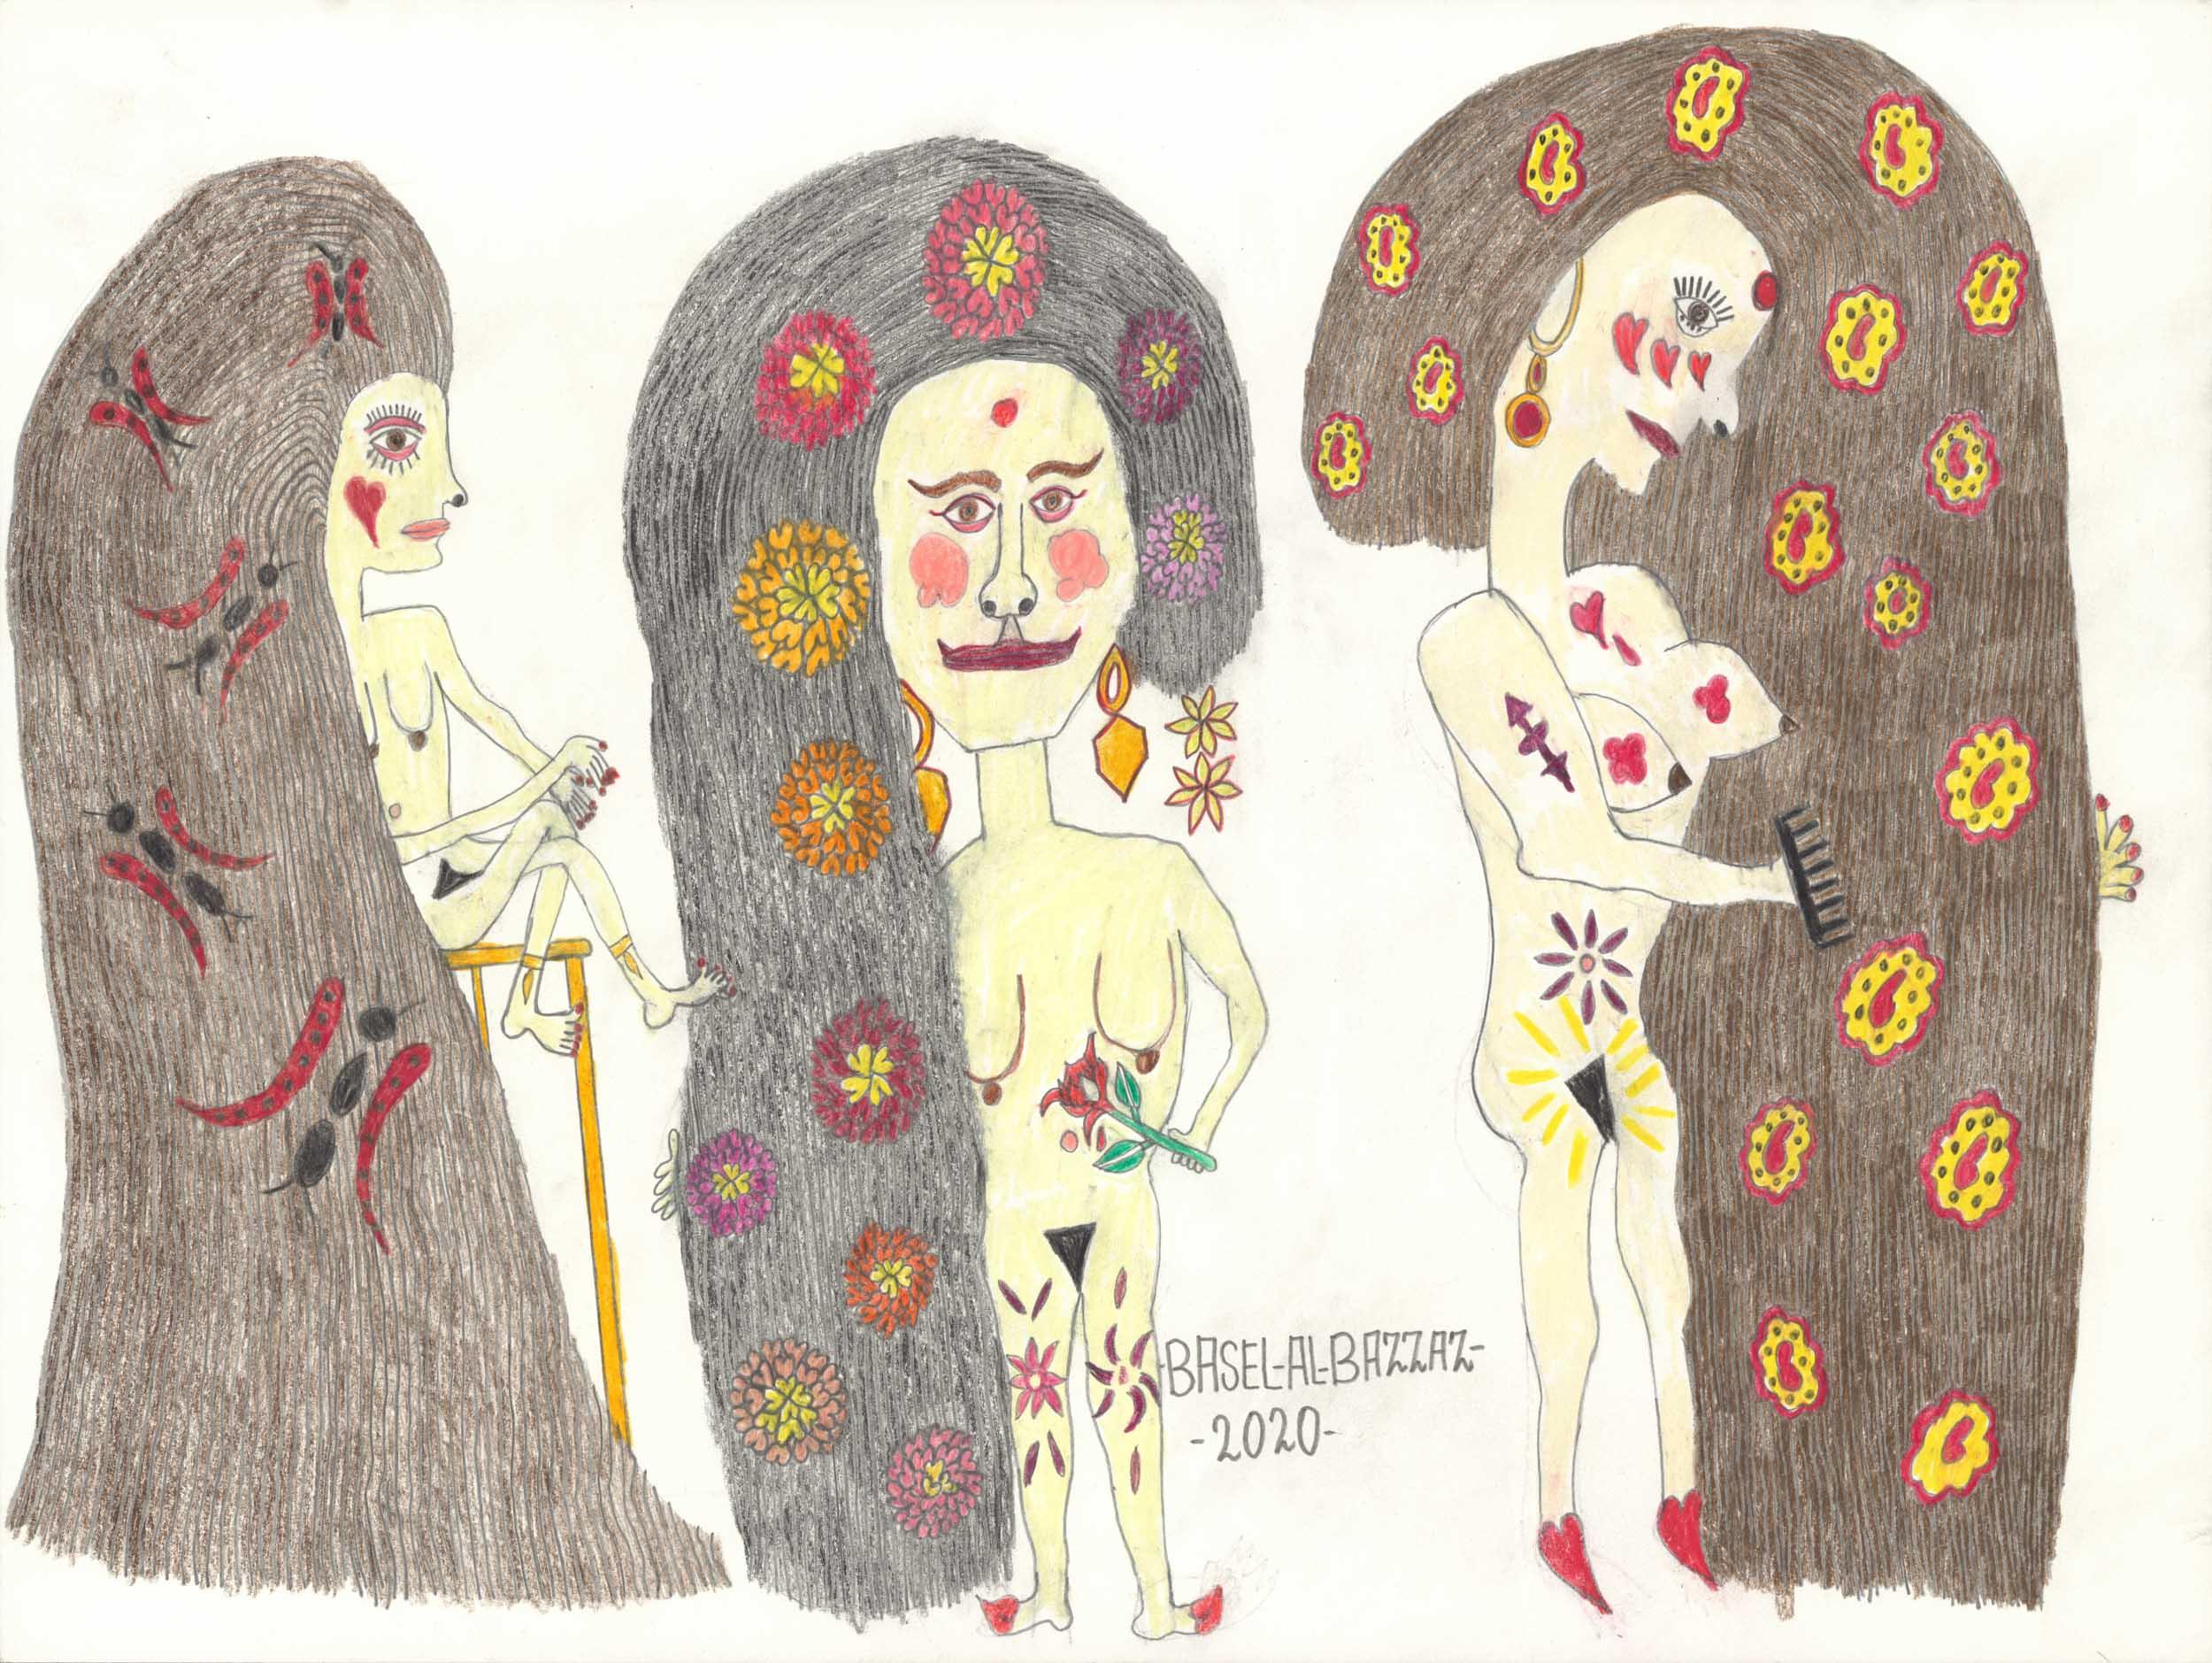 al-bazzaz basel - Mädels mit vollem Haar / Girls with thick hair